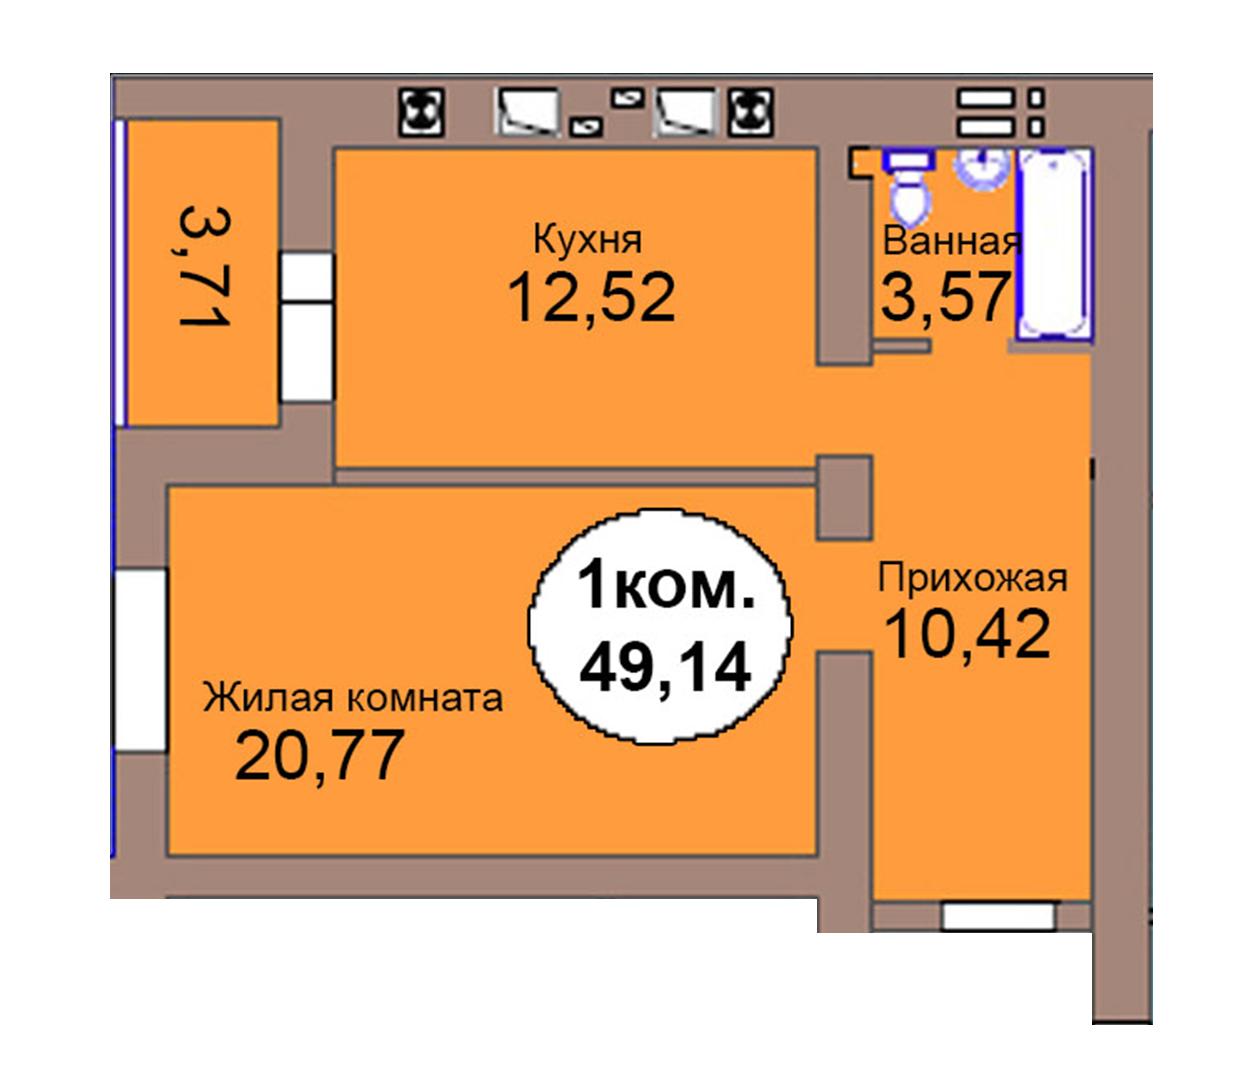 1-комн. кв. по пер. Калининградский, 4  кв. 125 в Калининграде